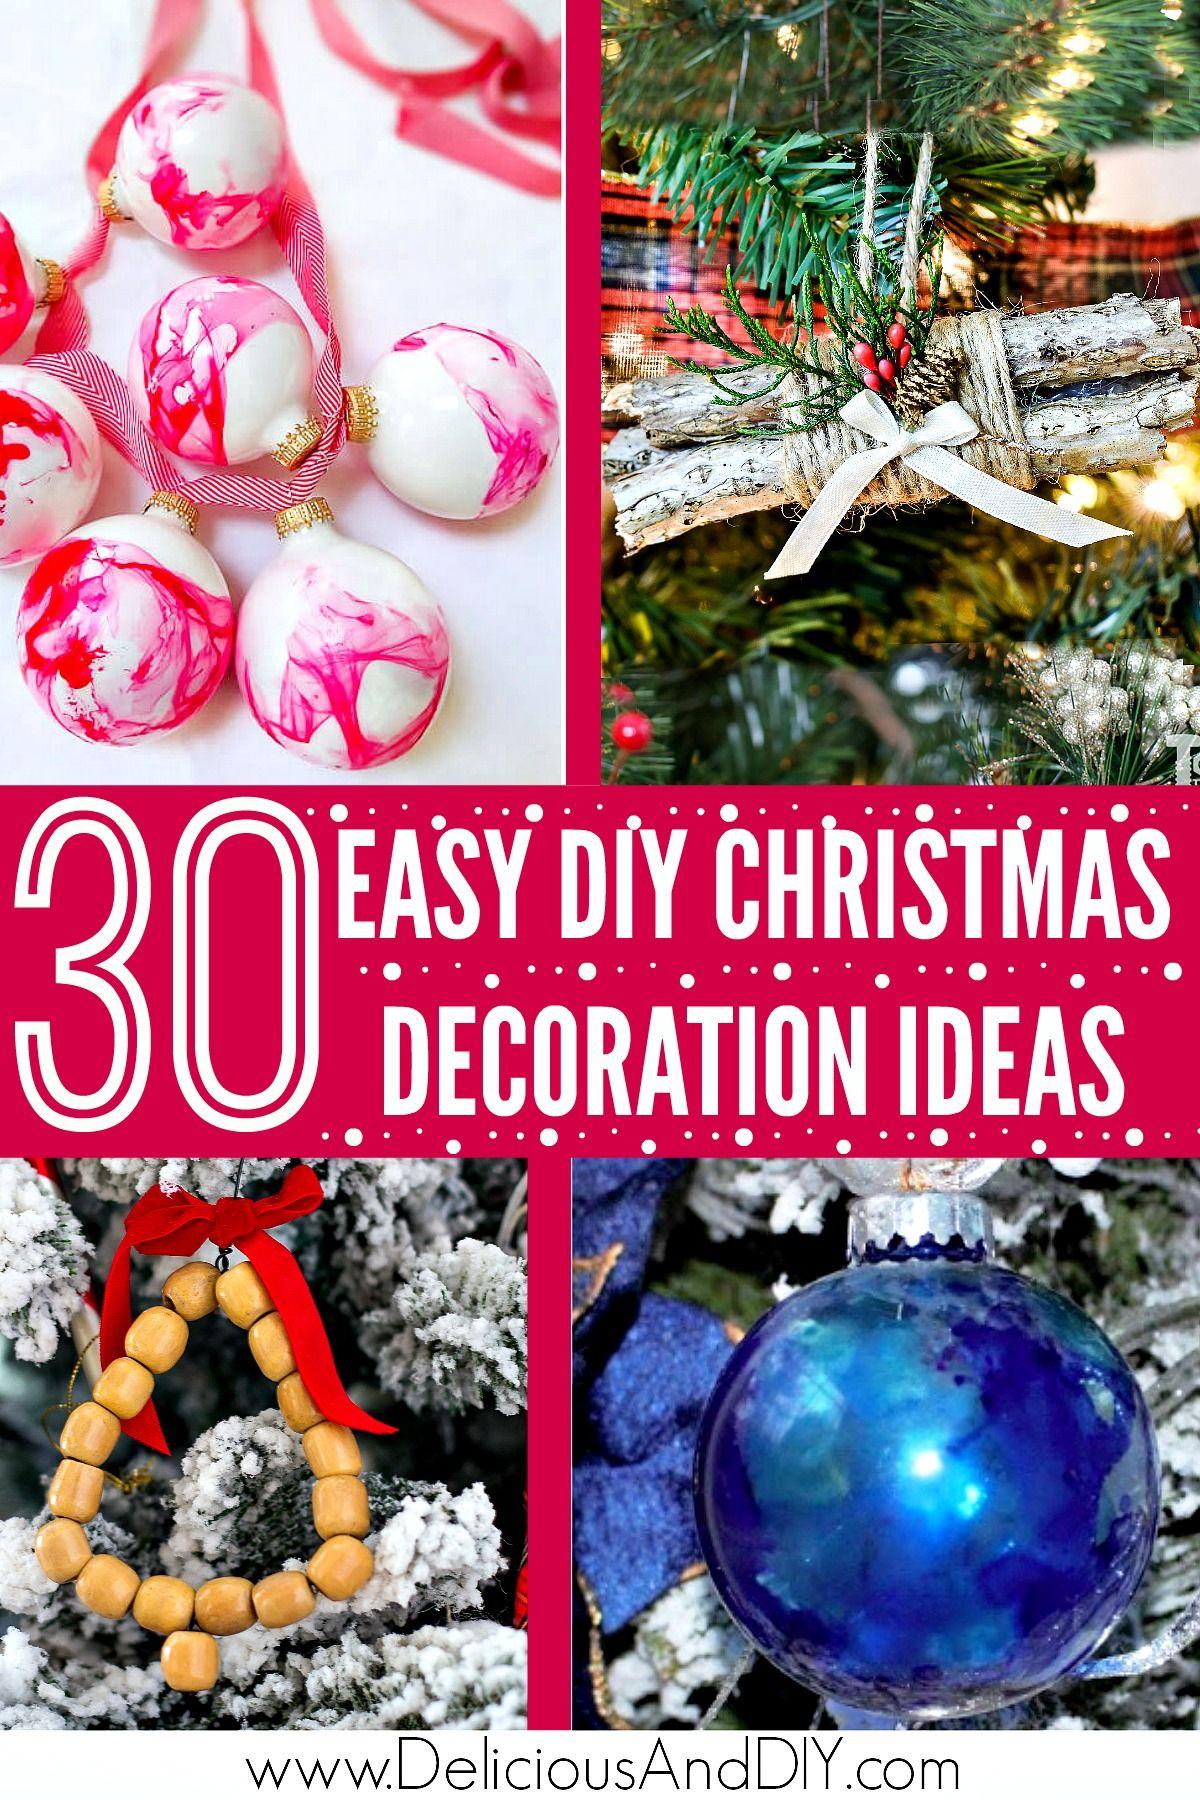 30 Gorgeous Diy Christmas Decoration Ideas Delicious And Diy Easy Christmas Diy Diy Christmas Decorations Easy Christmas Decor Diy